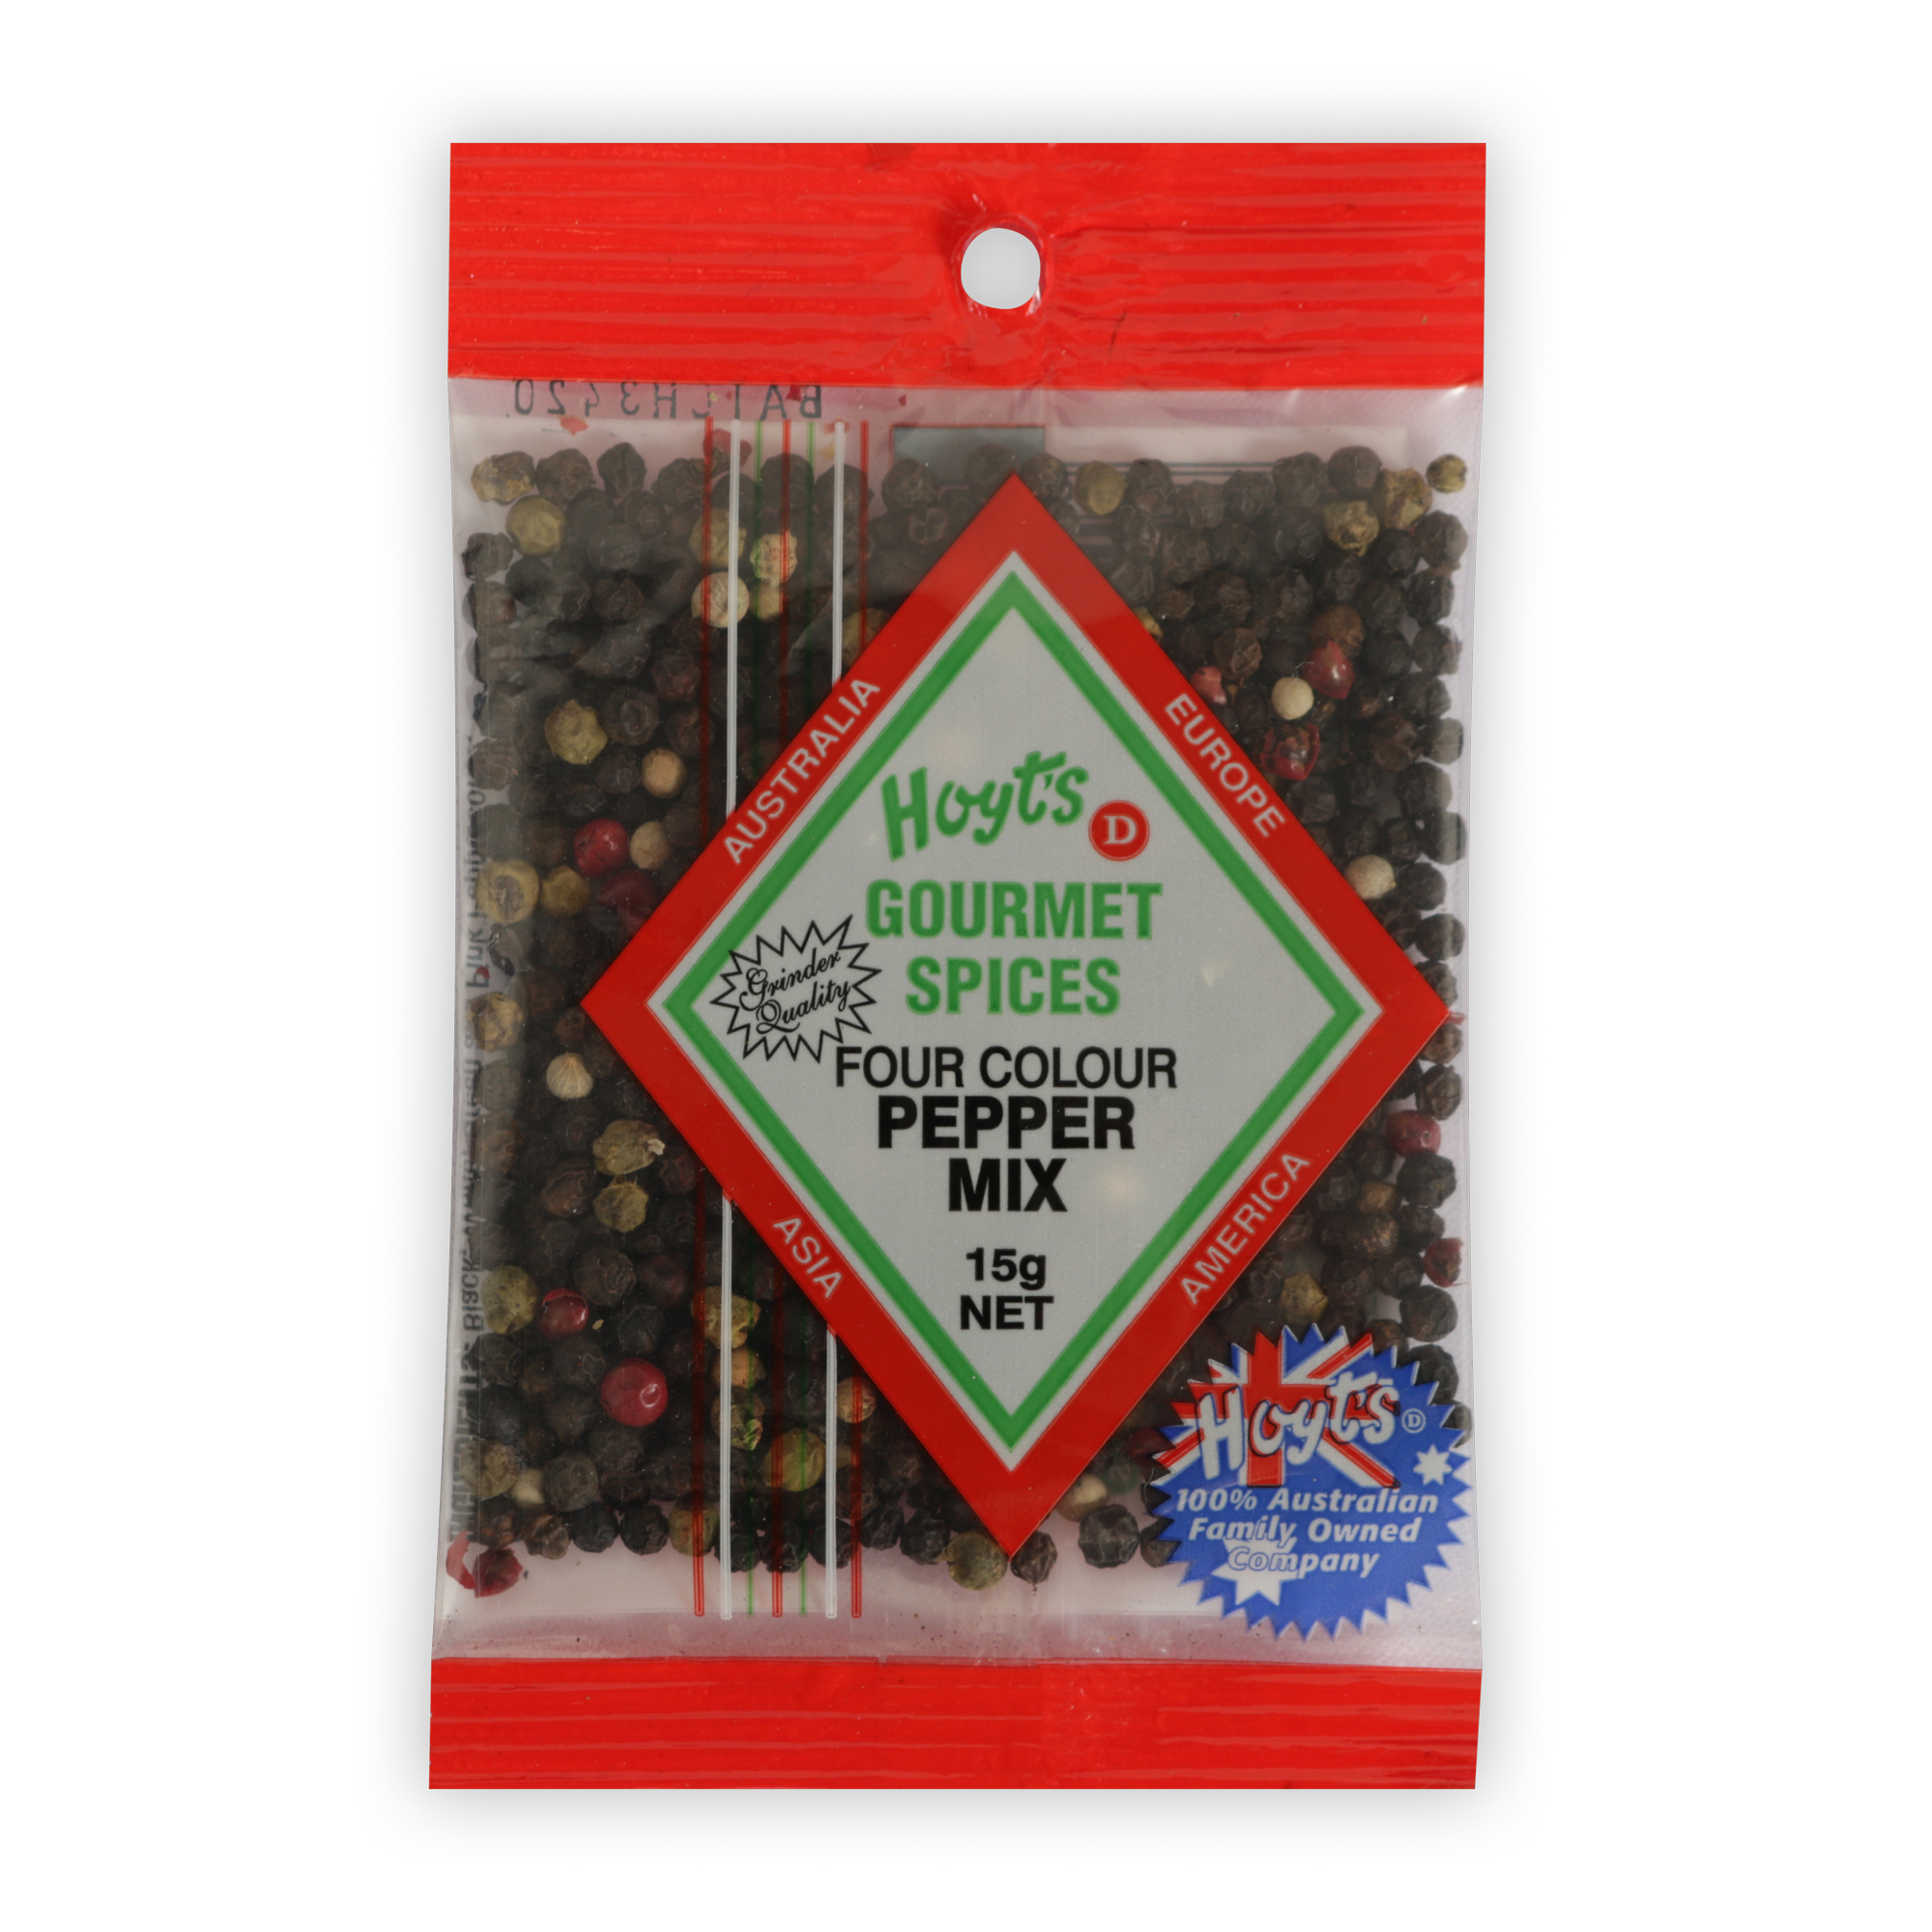 Hoyts Gourmet Peppercorn - 4 Colour Mix 15g